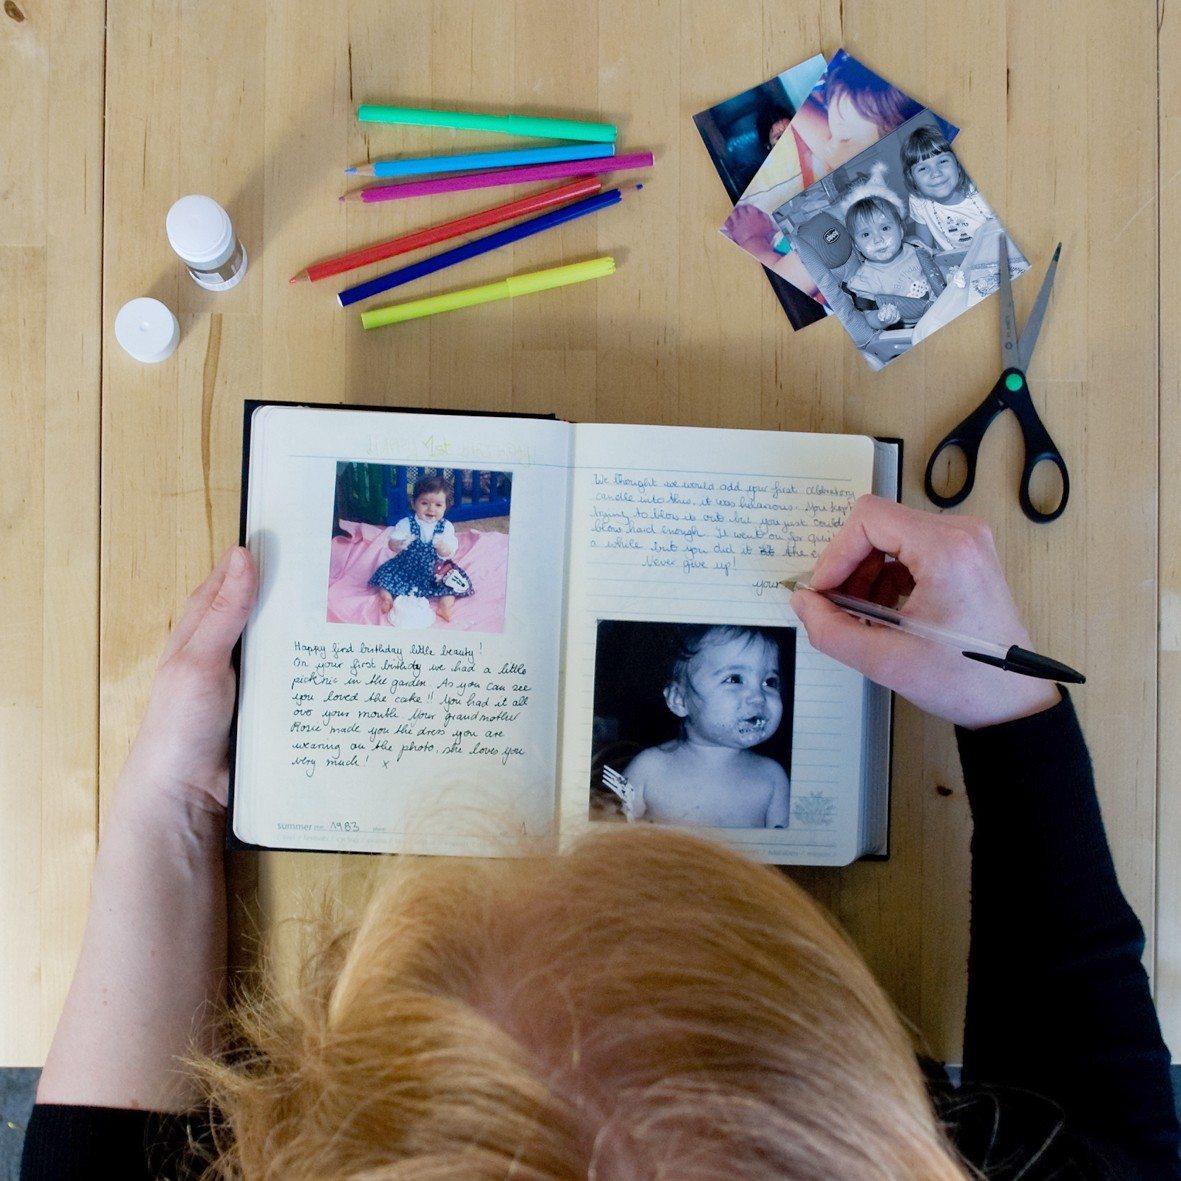 Dagboek - My Life Story